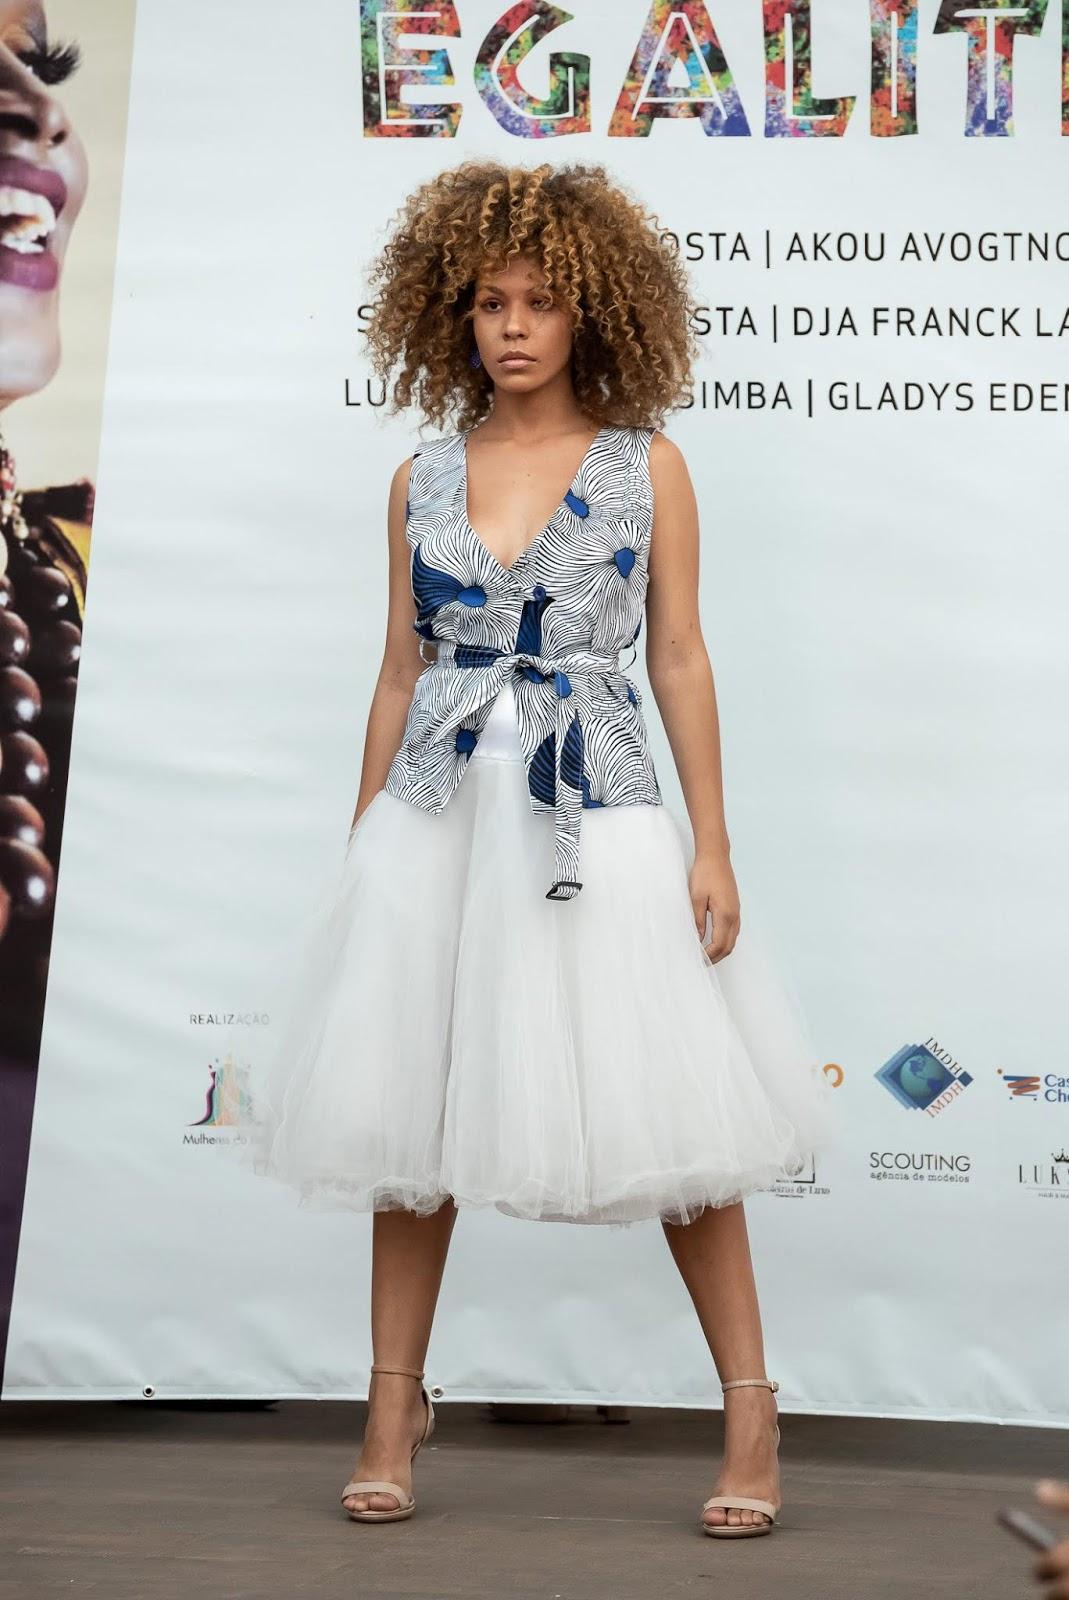 Moda Africana recebe apoio em Brasília